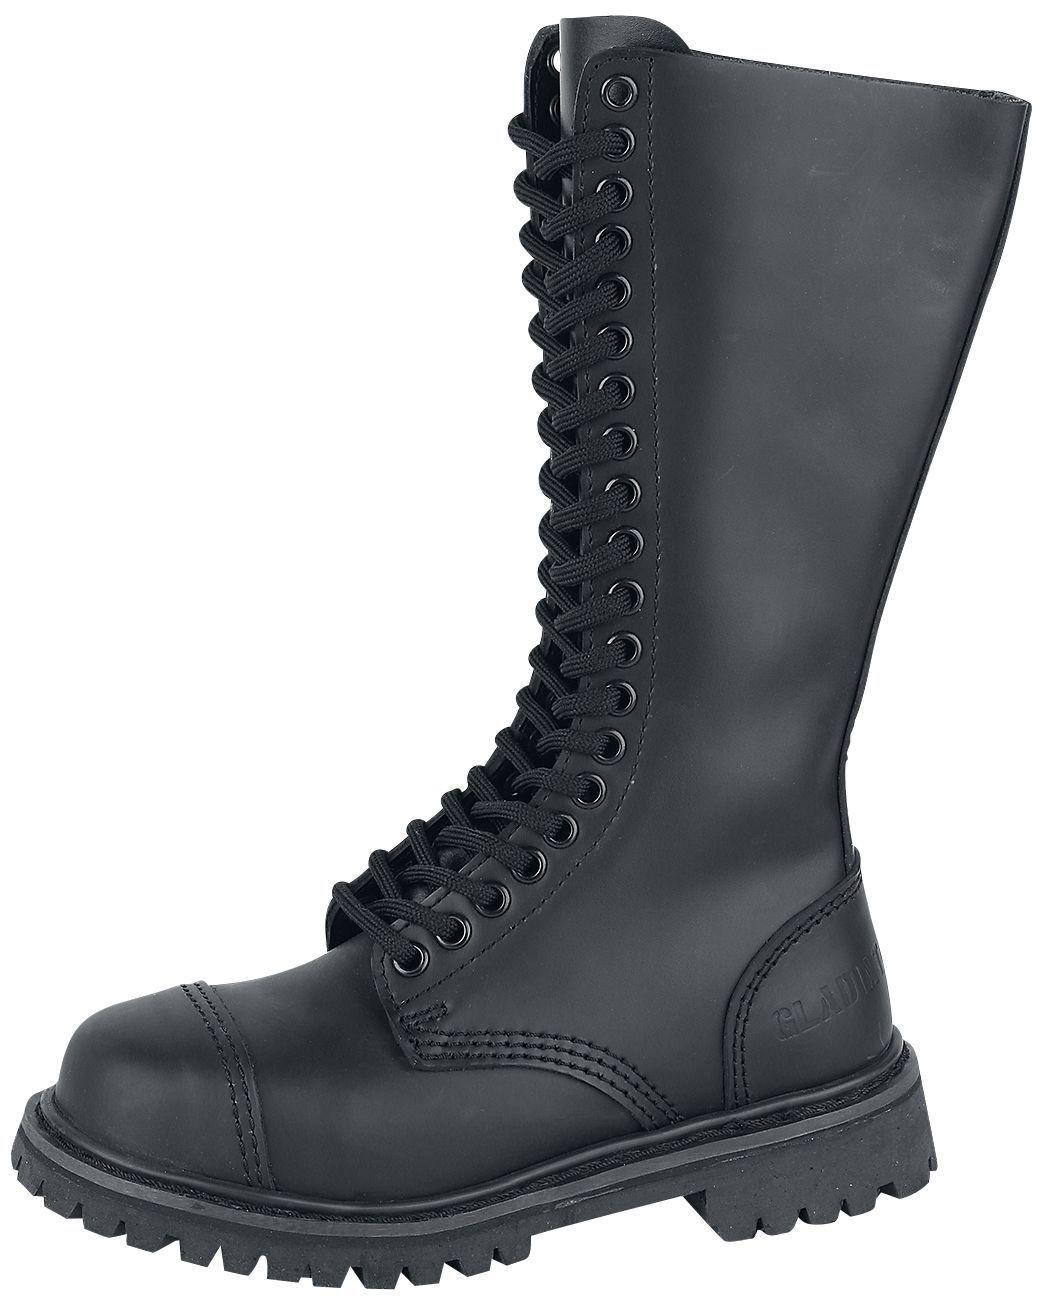 Brandit Militärschuhe Stiefel Stiefel Mann Frau Militär Phantom boots 20 eyelet